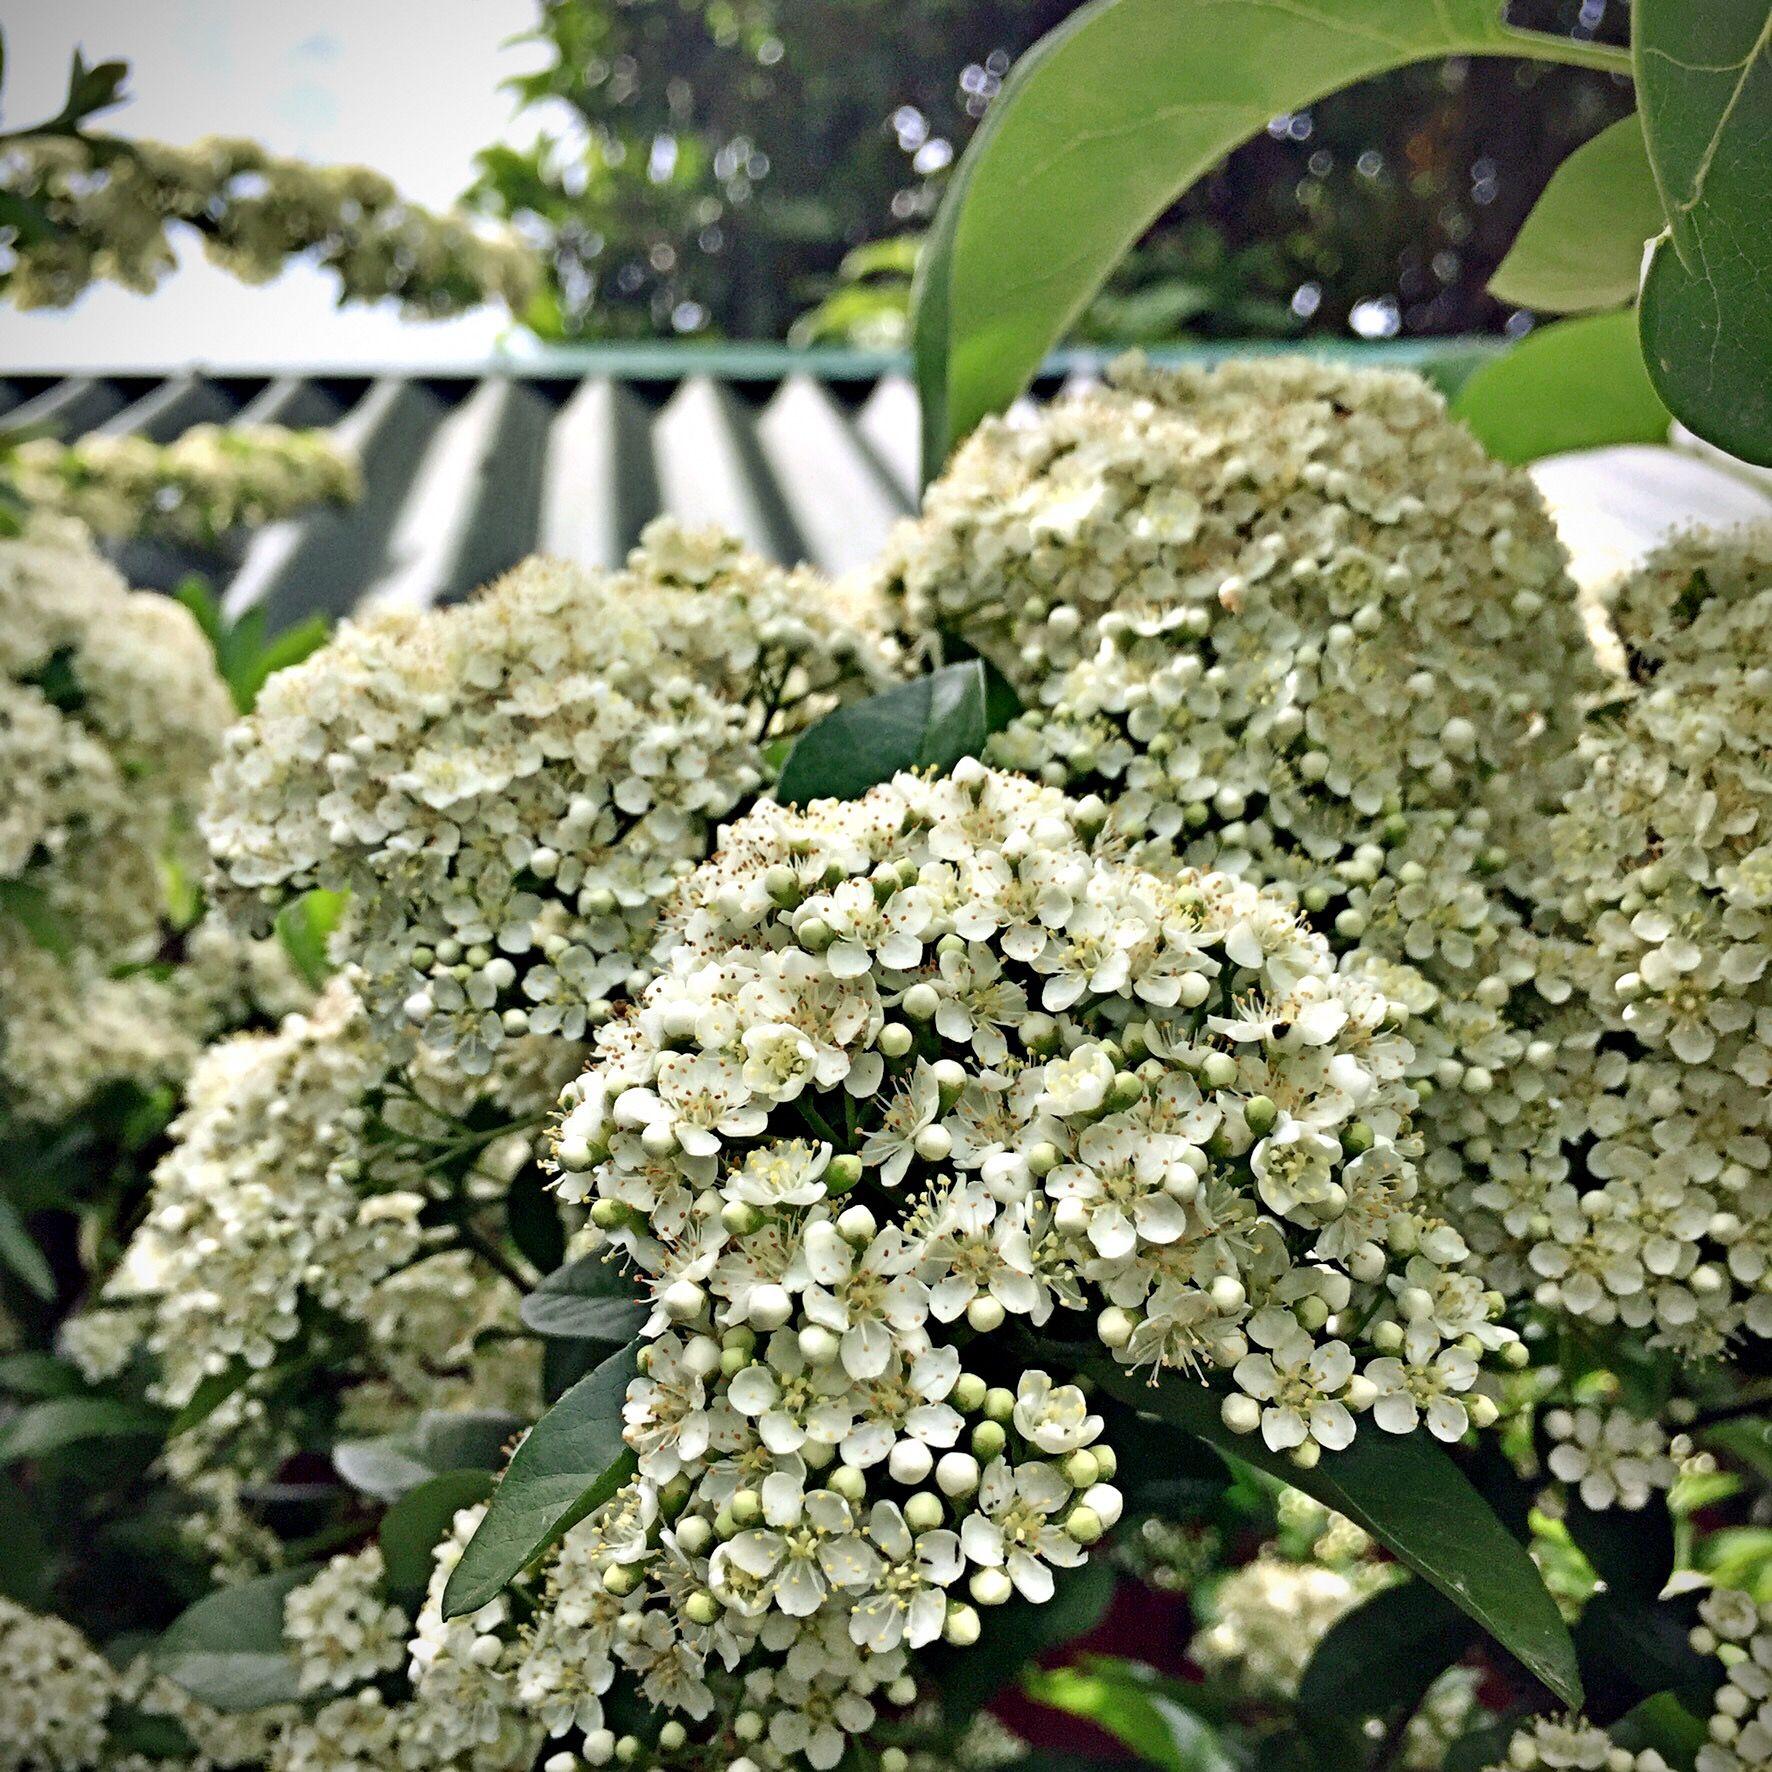 Pin By Mirjana Apro On My Garden, My Houseplants & Garden